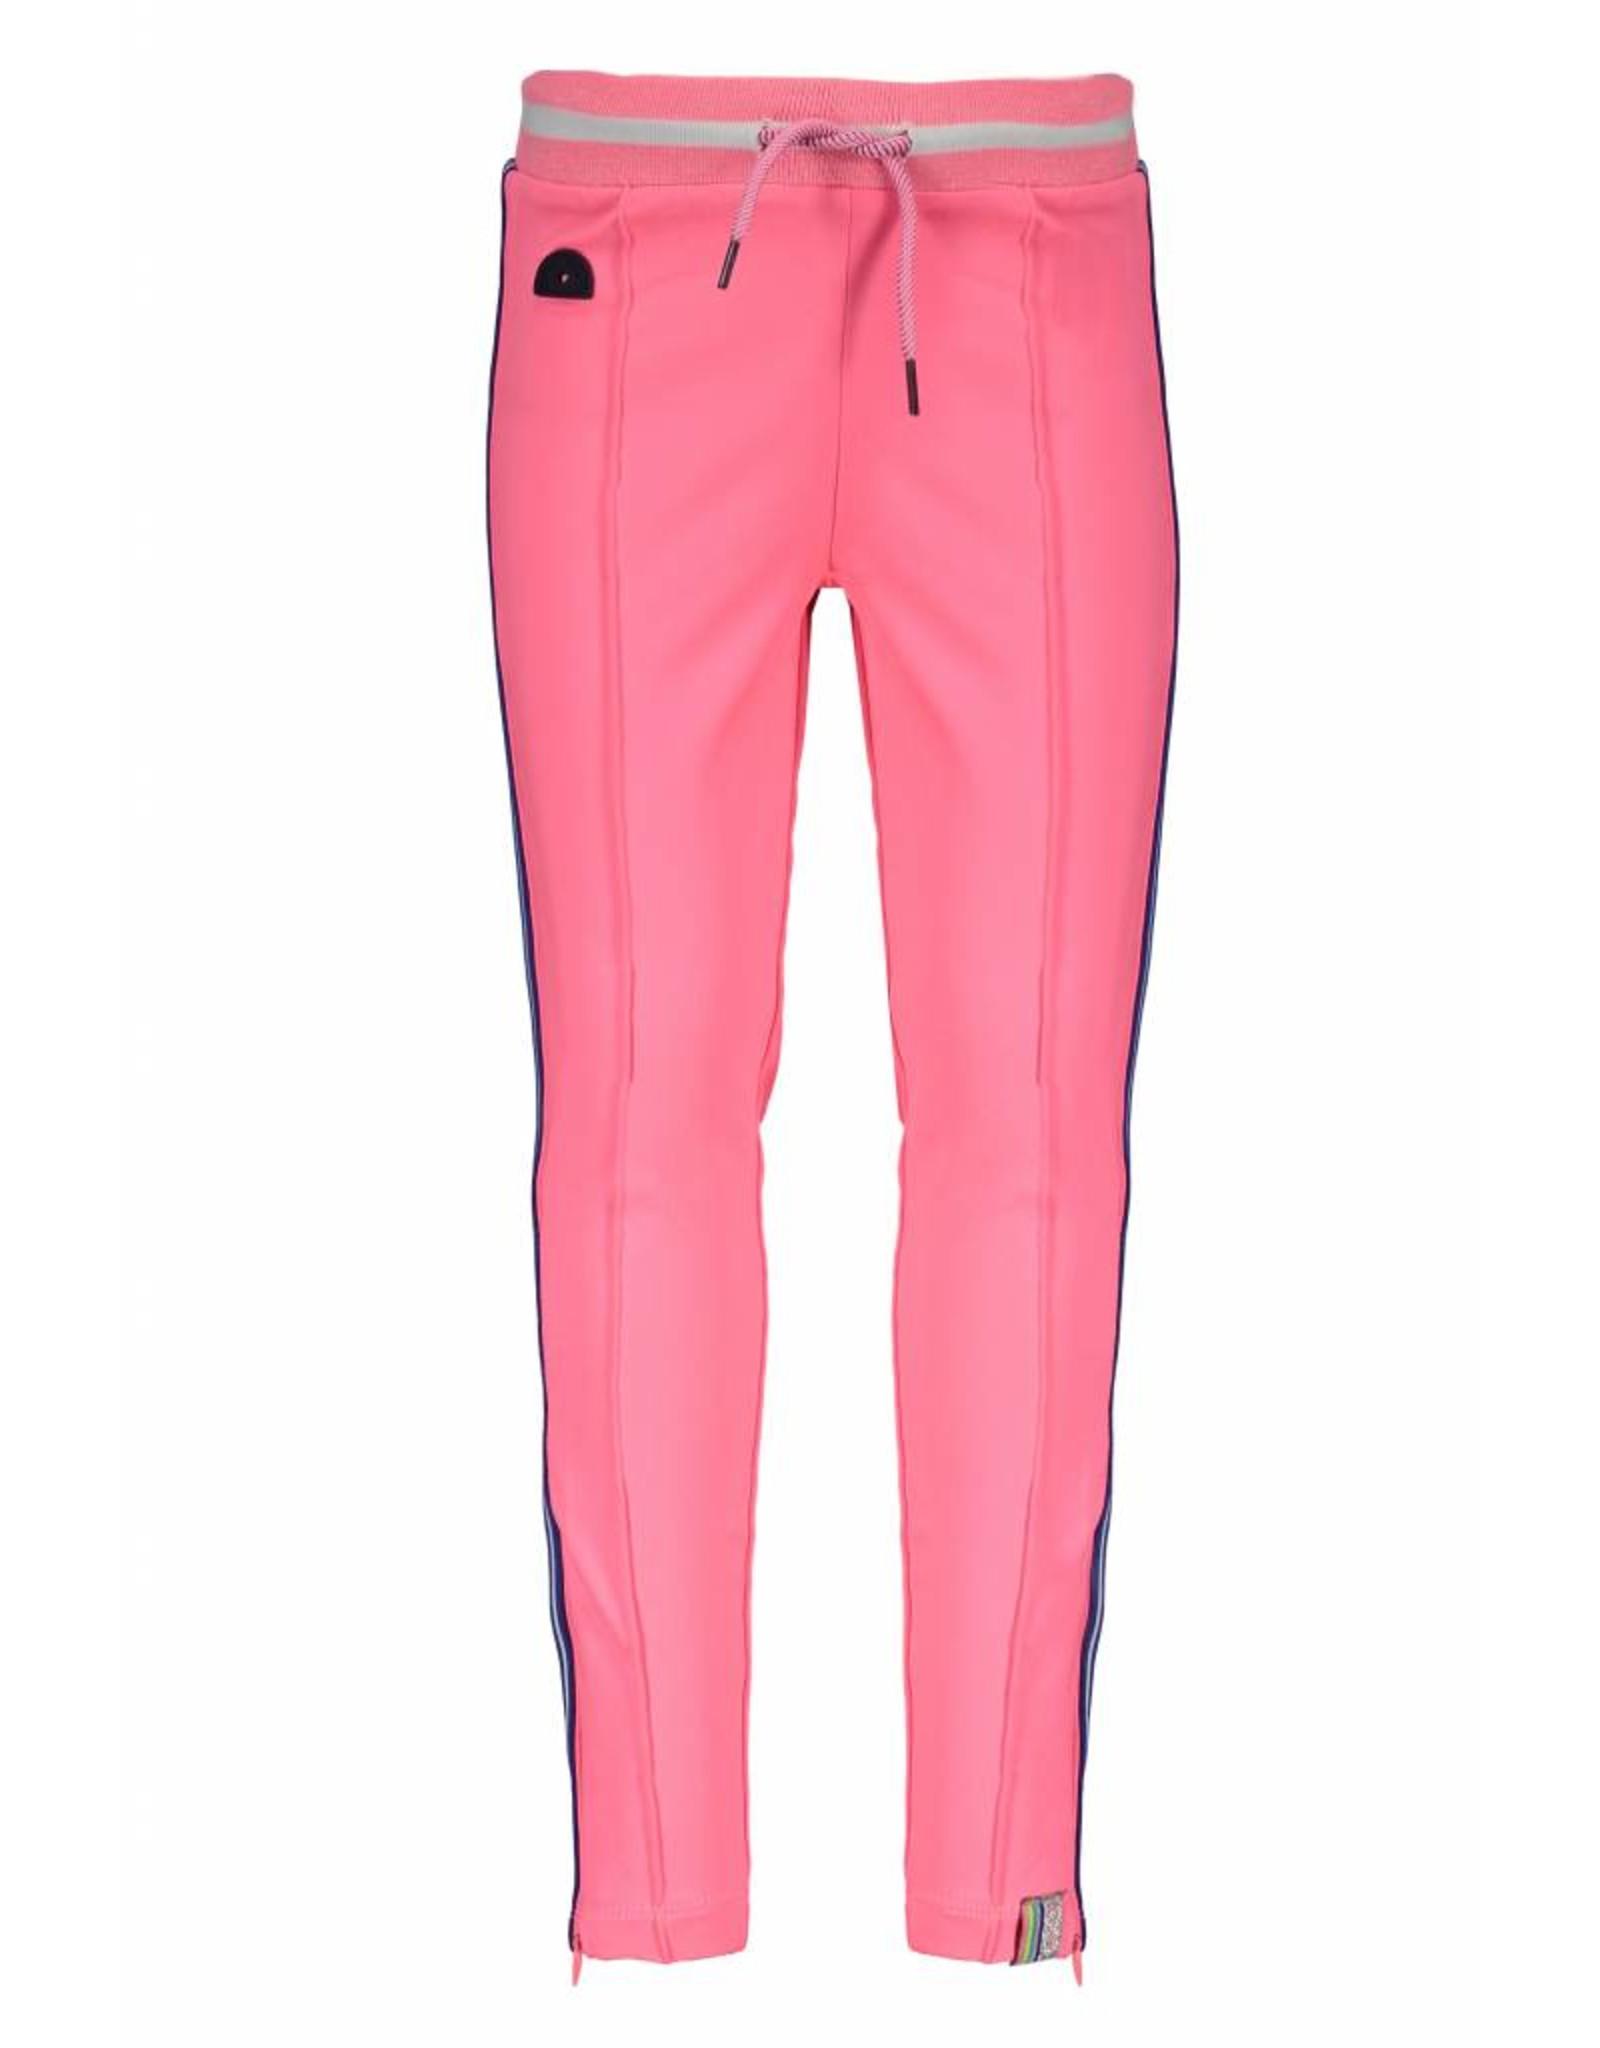 B.Nosy B.Nosy Girls Sportive Pants With Zipper-Candy